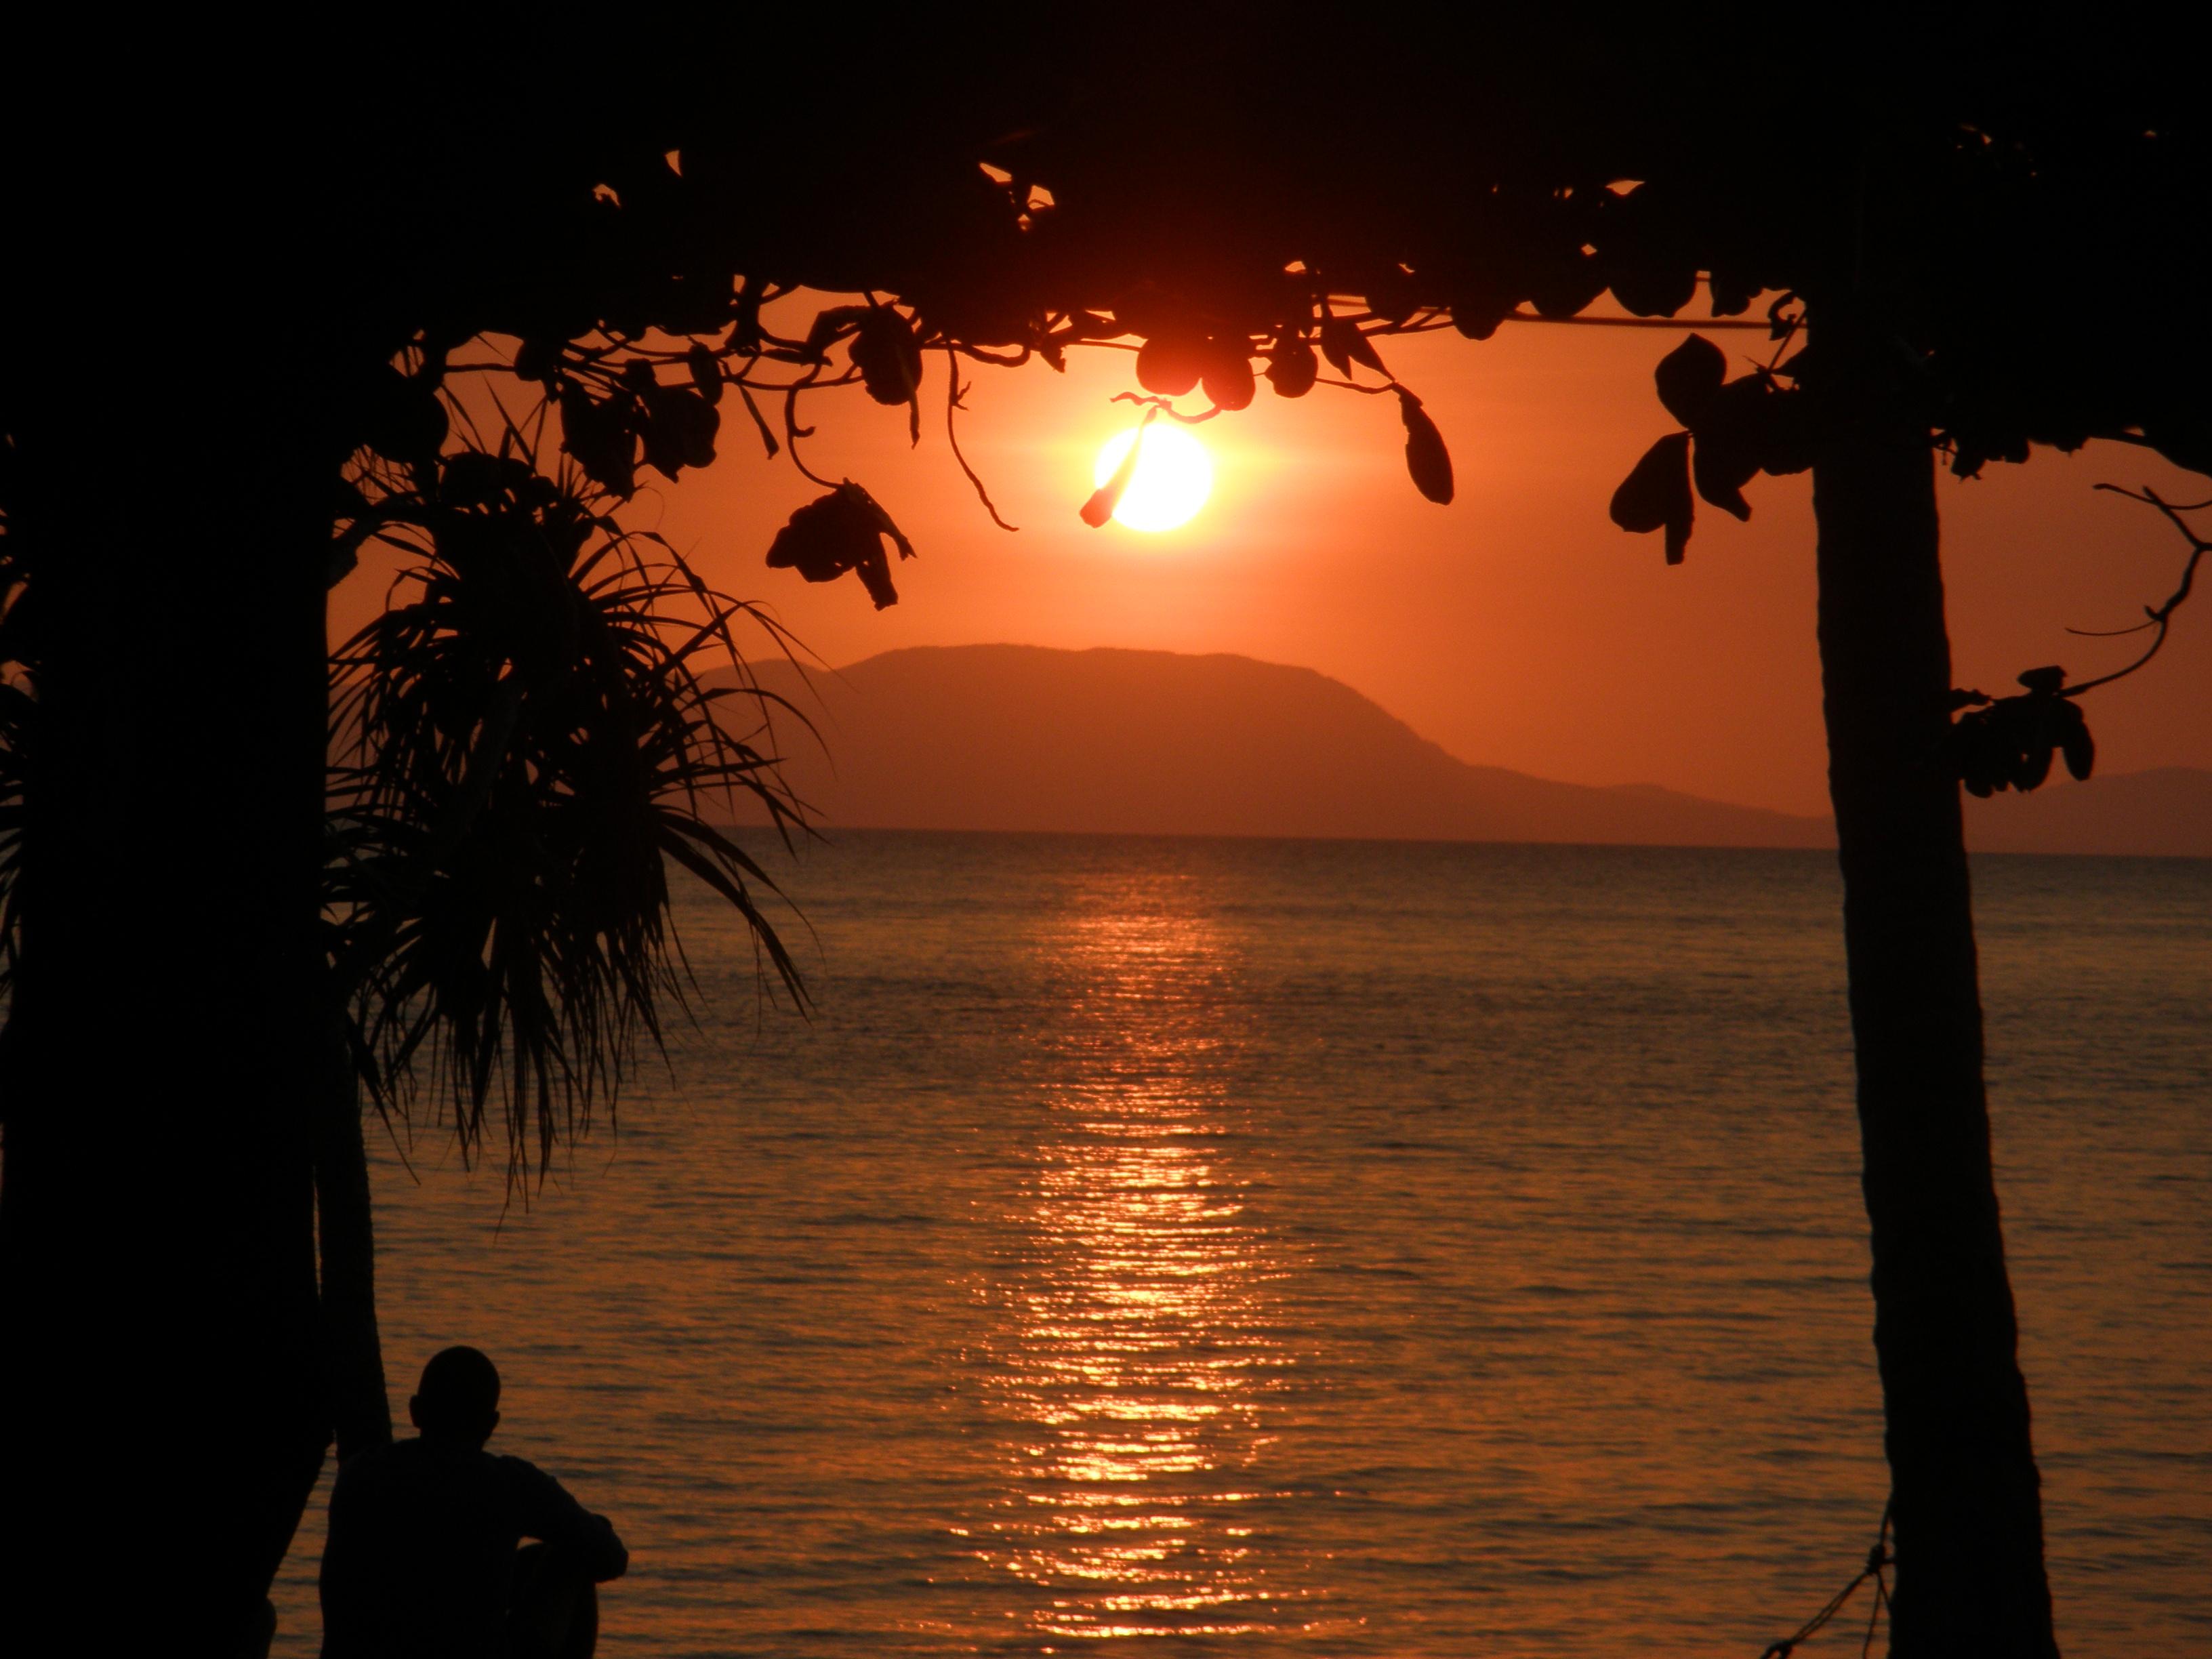 sunset, kon thonsay